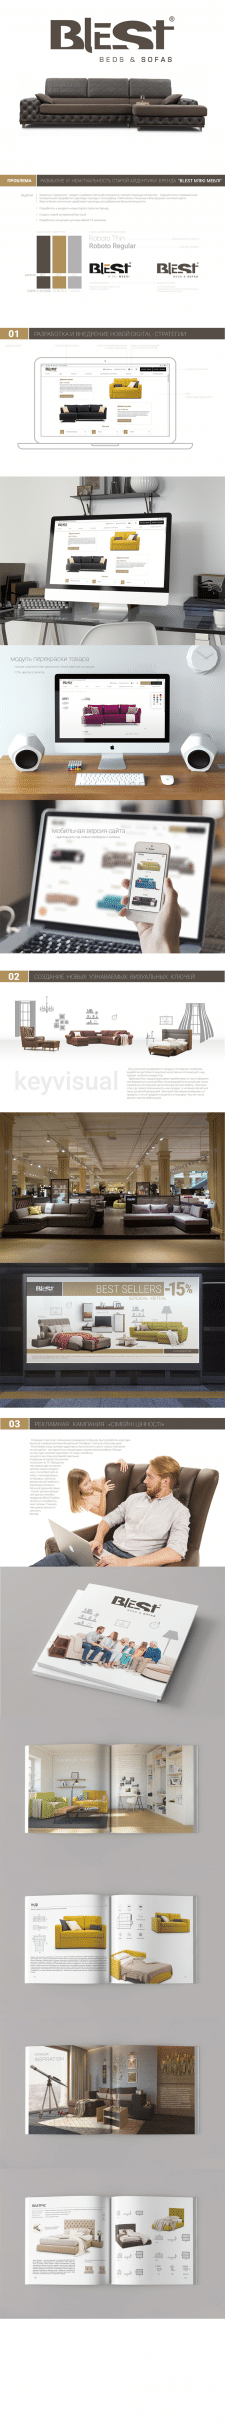 Ребрендинг для предприятия мягкой мебели